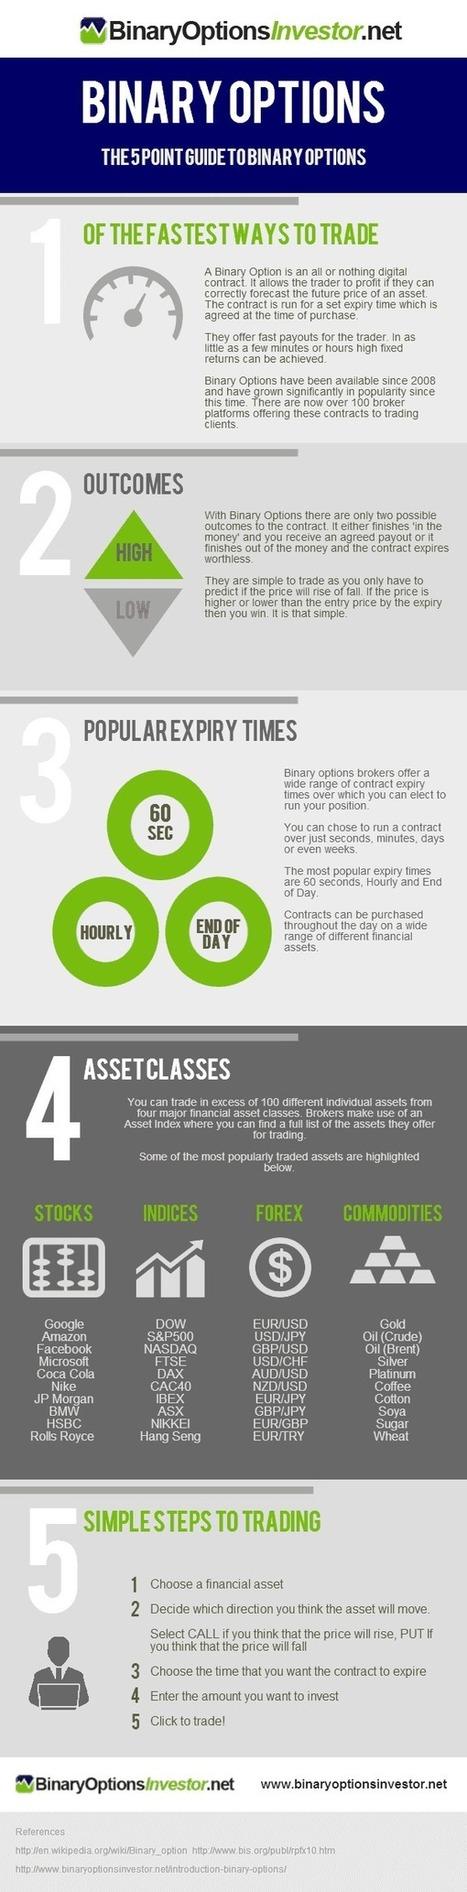 Guide To Binary Options Infographic | BinaryOptionsInvestor.net | binary options | Scoop.it